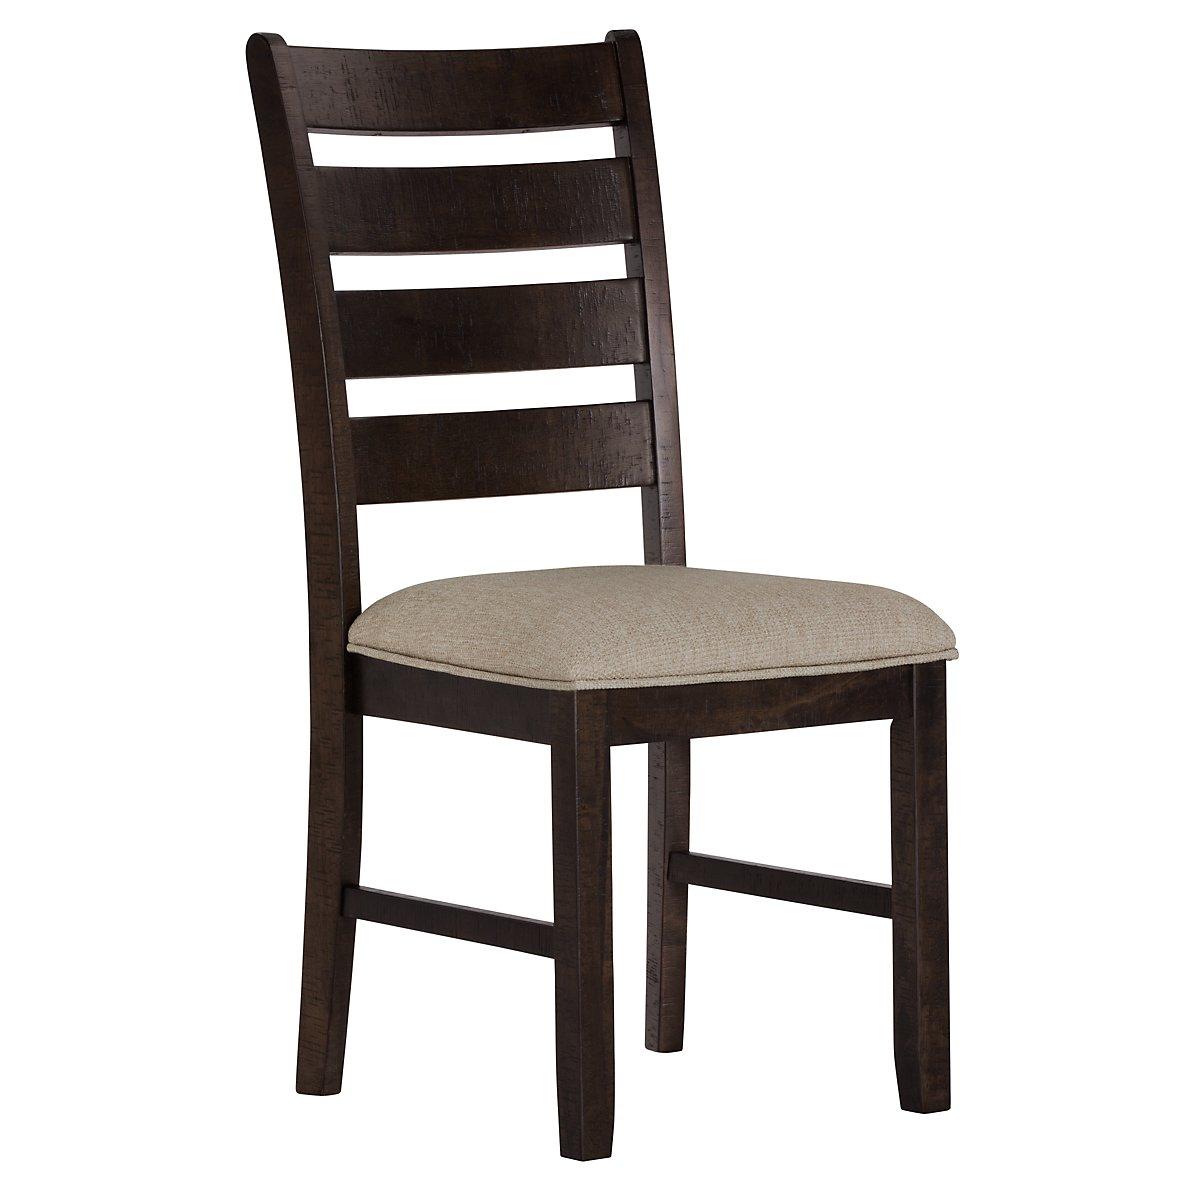 City furniture sawyer dark tone wood side chair for Dining chairs dark wood